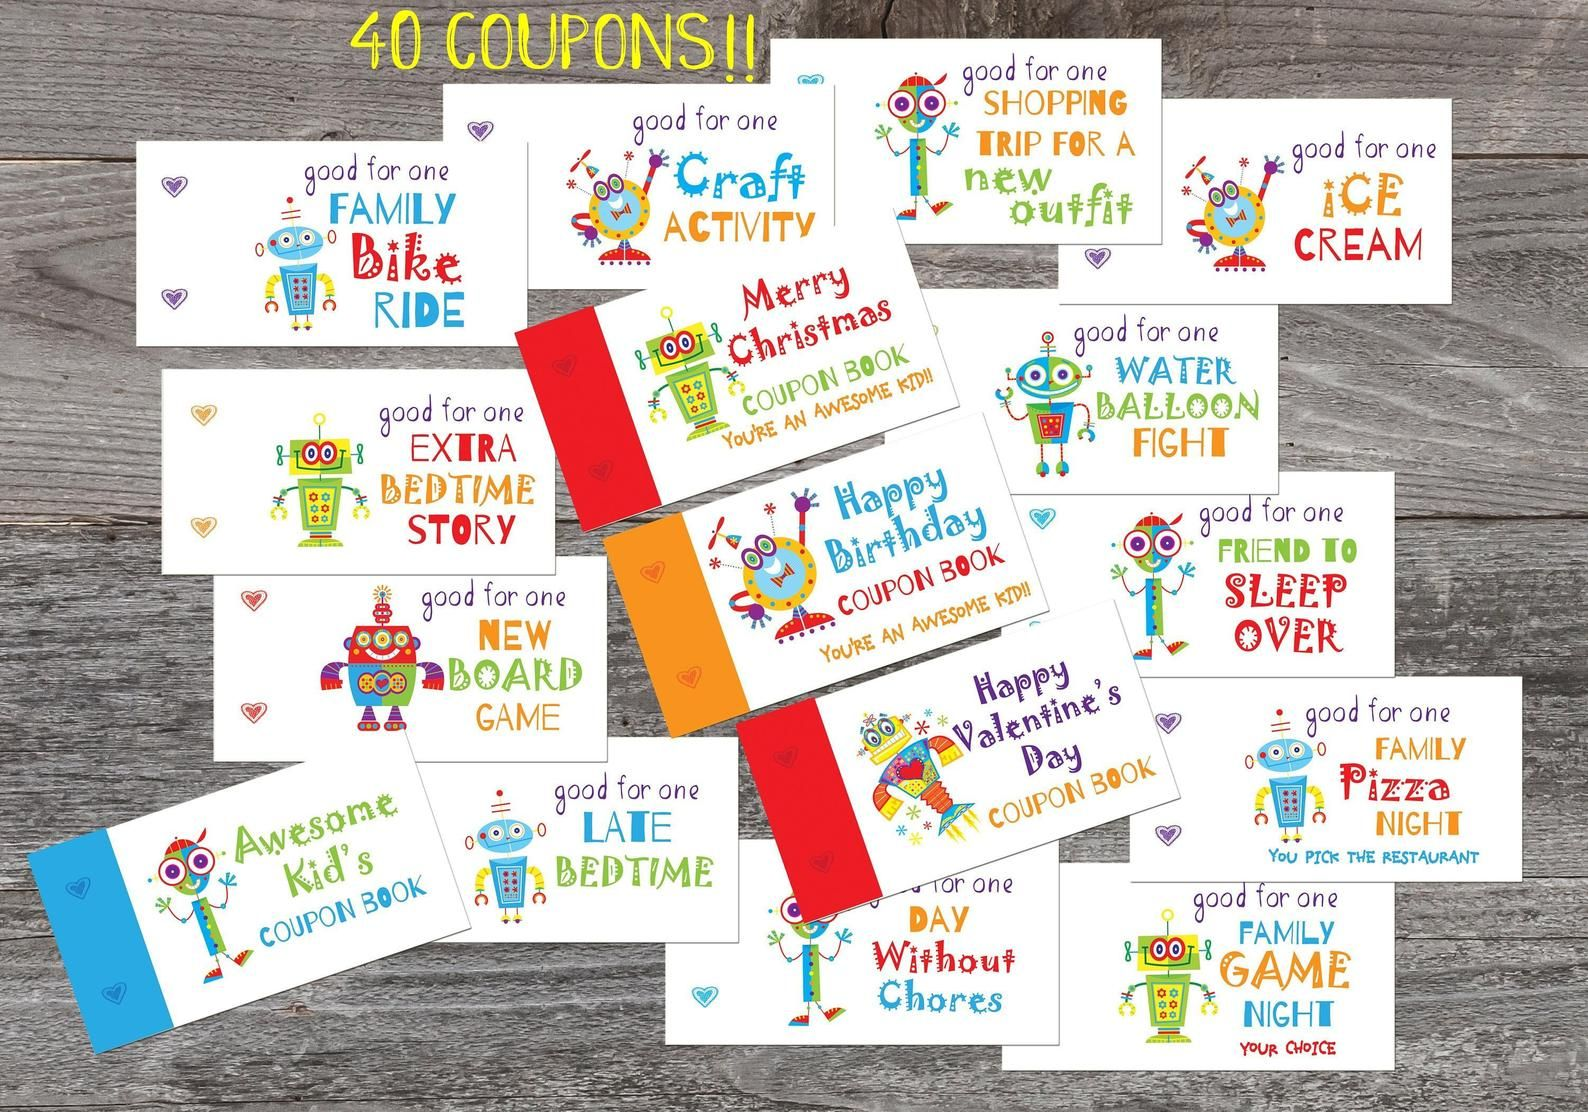 Coupon Book for Kids Birthday printable Love coupons gift